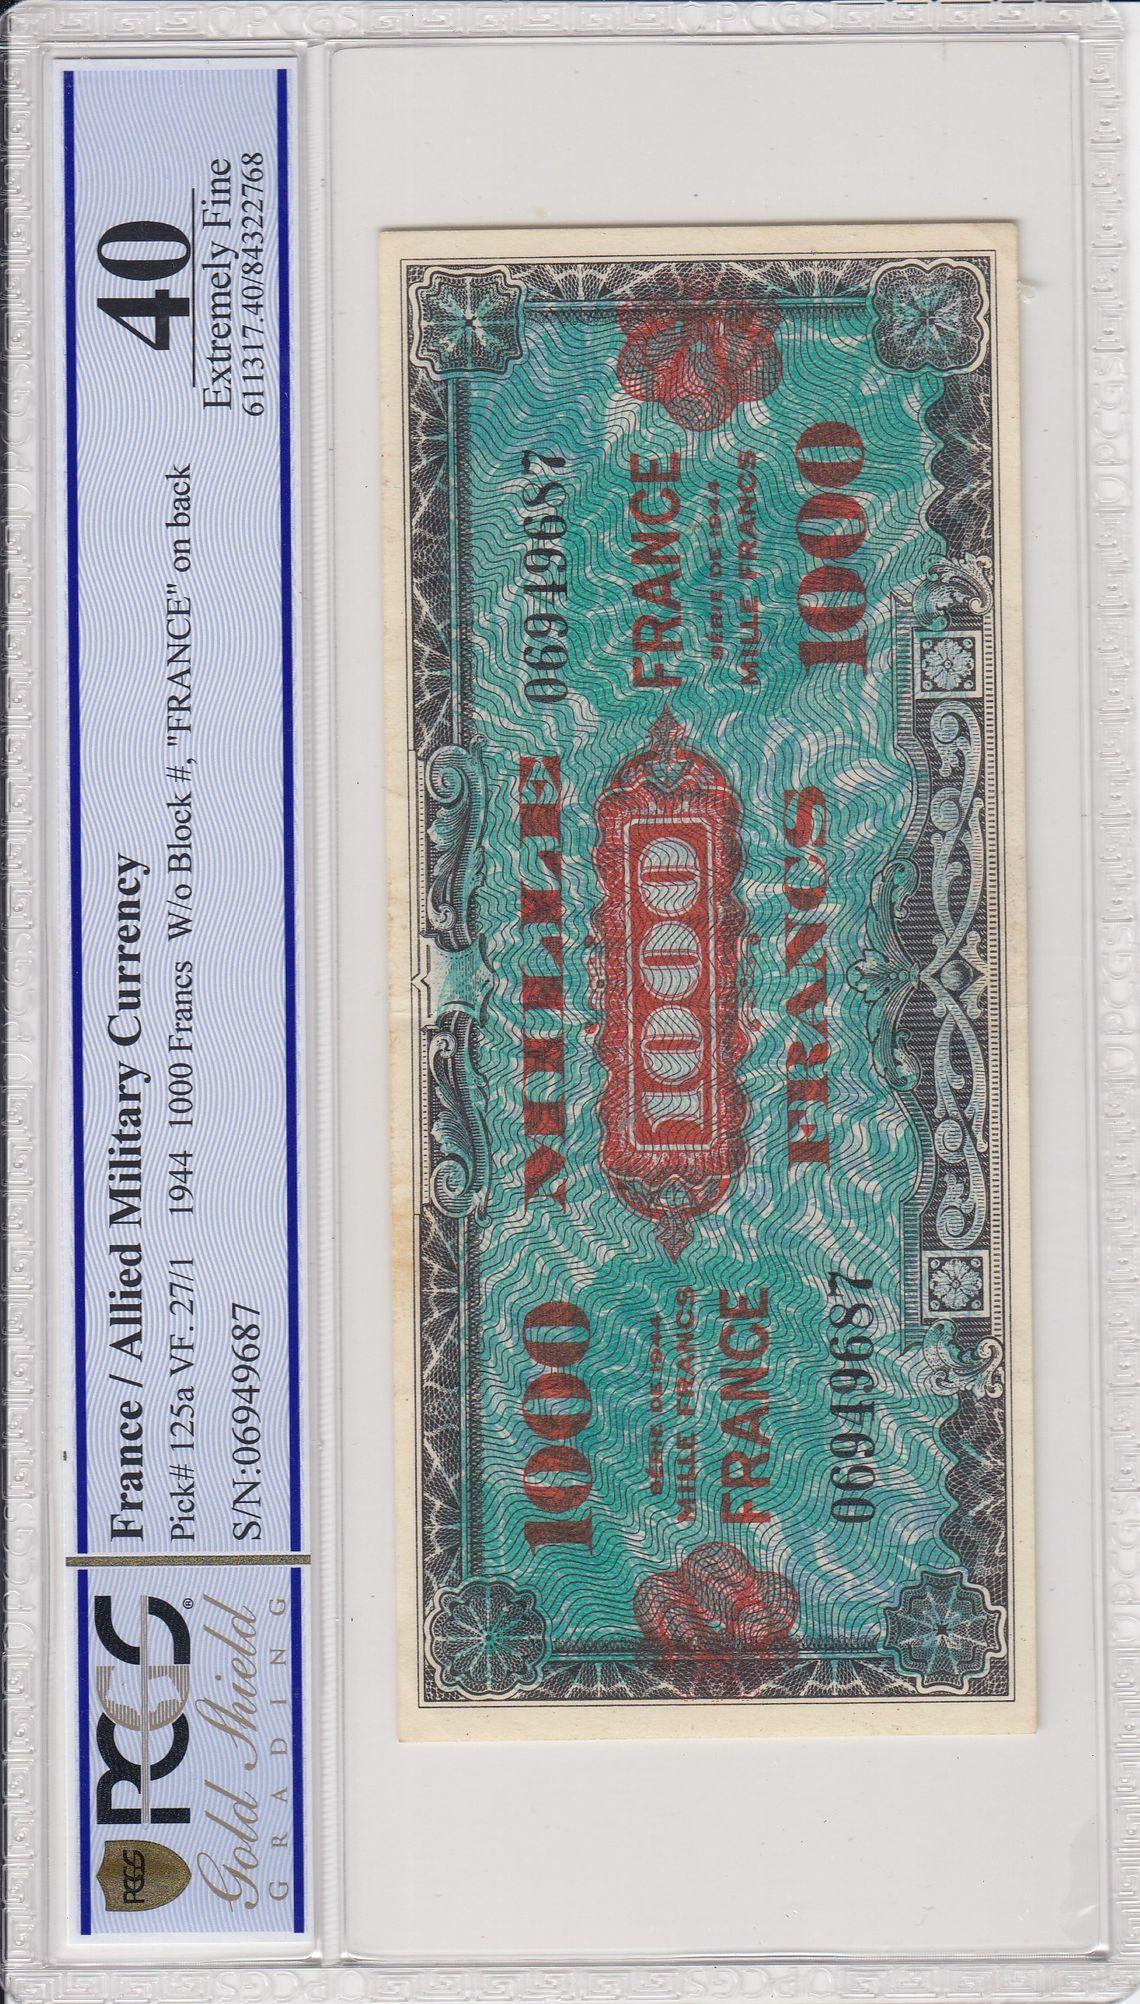 Cert 84322768 - Banknote Obverse